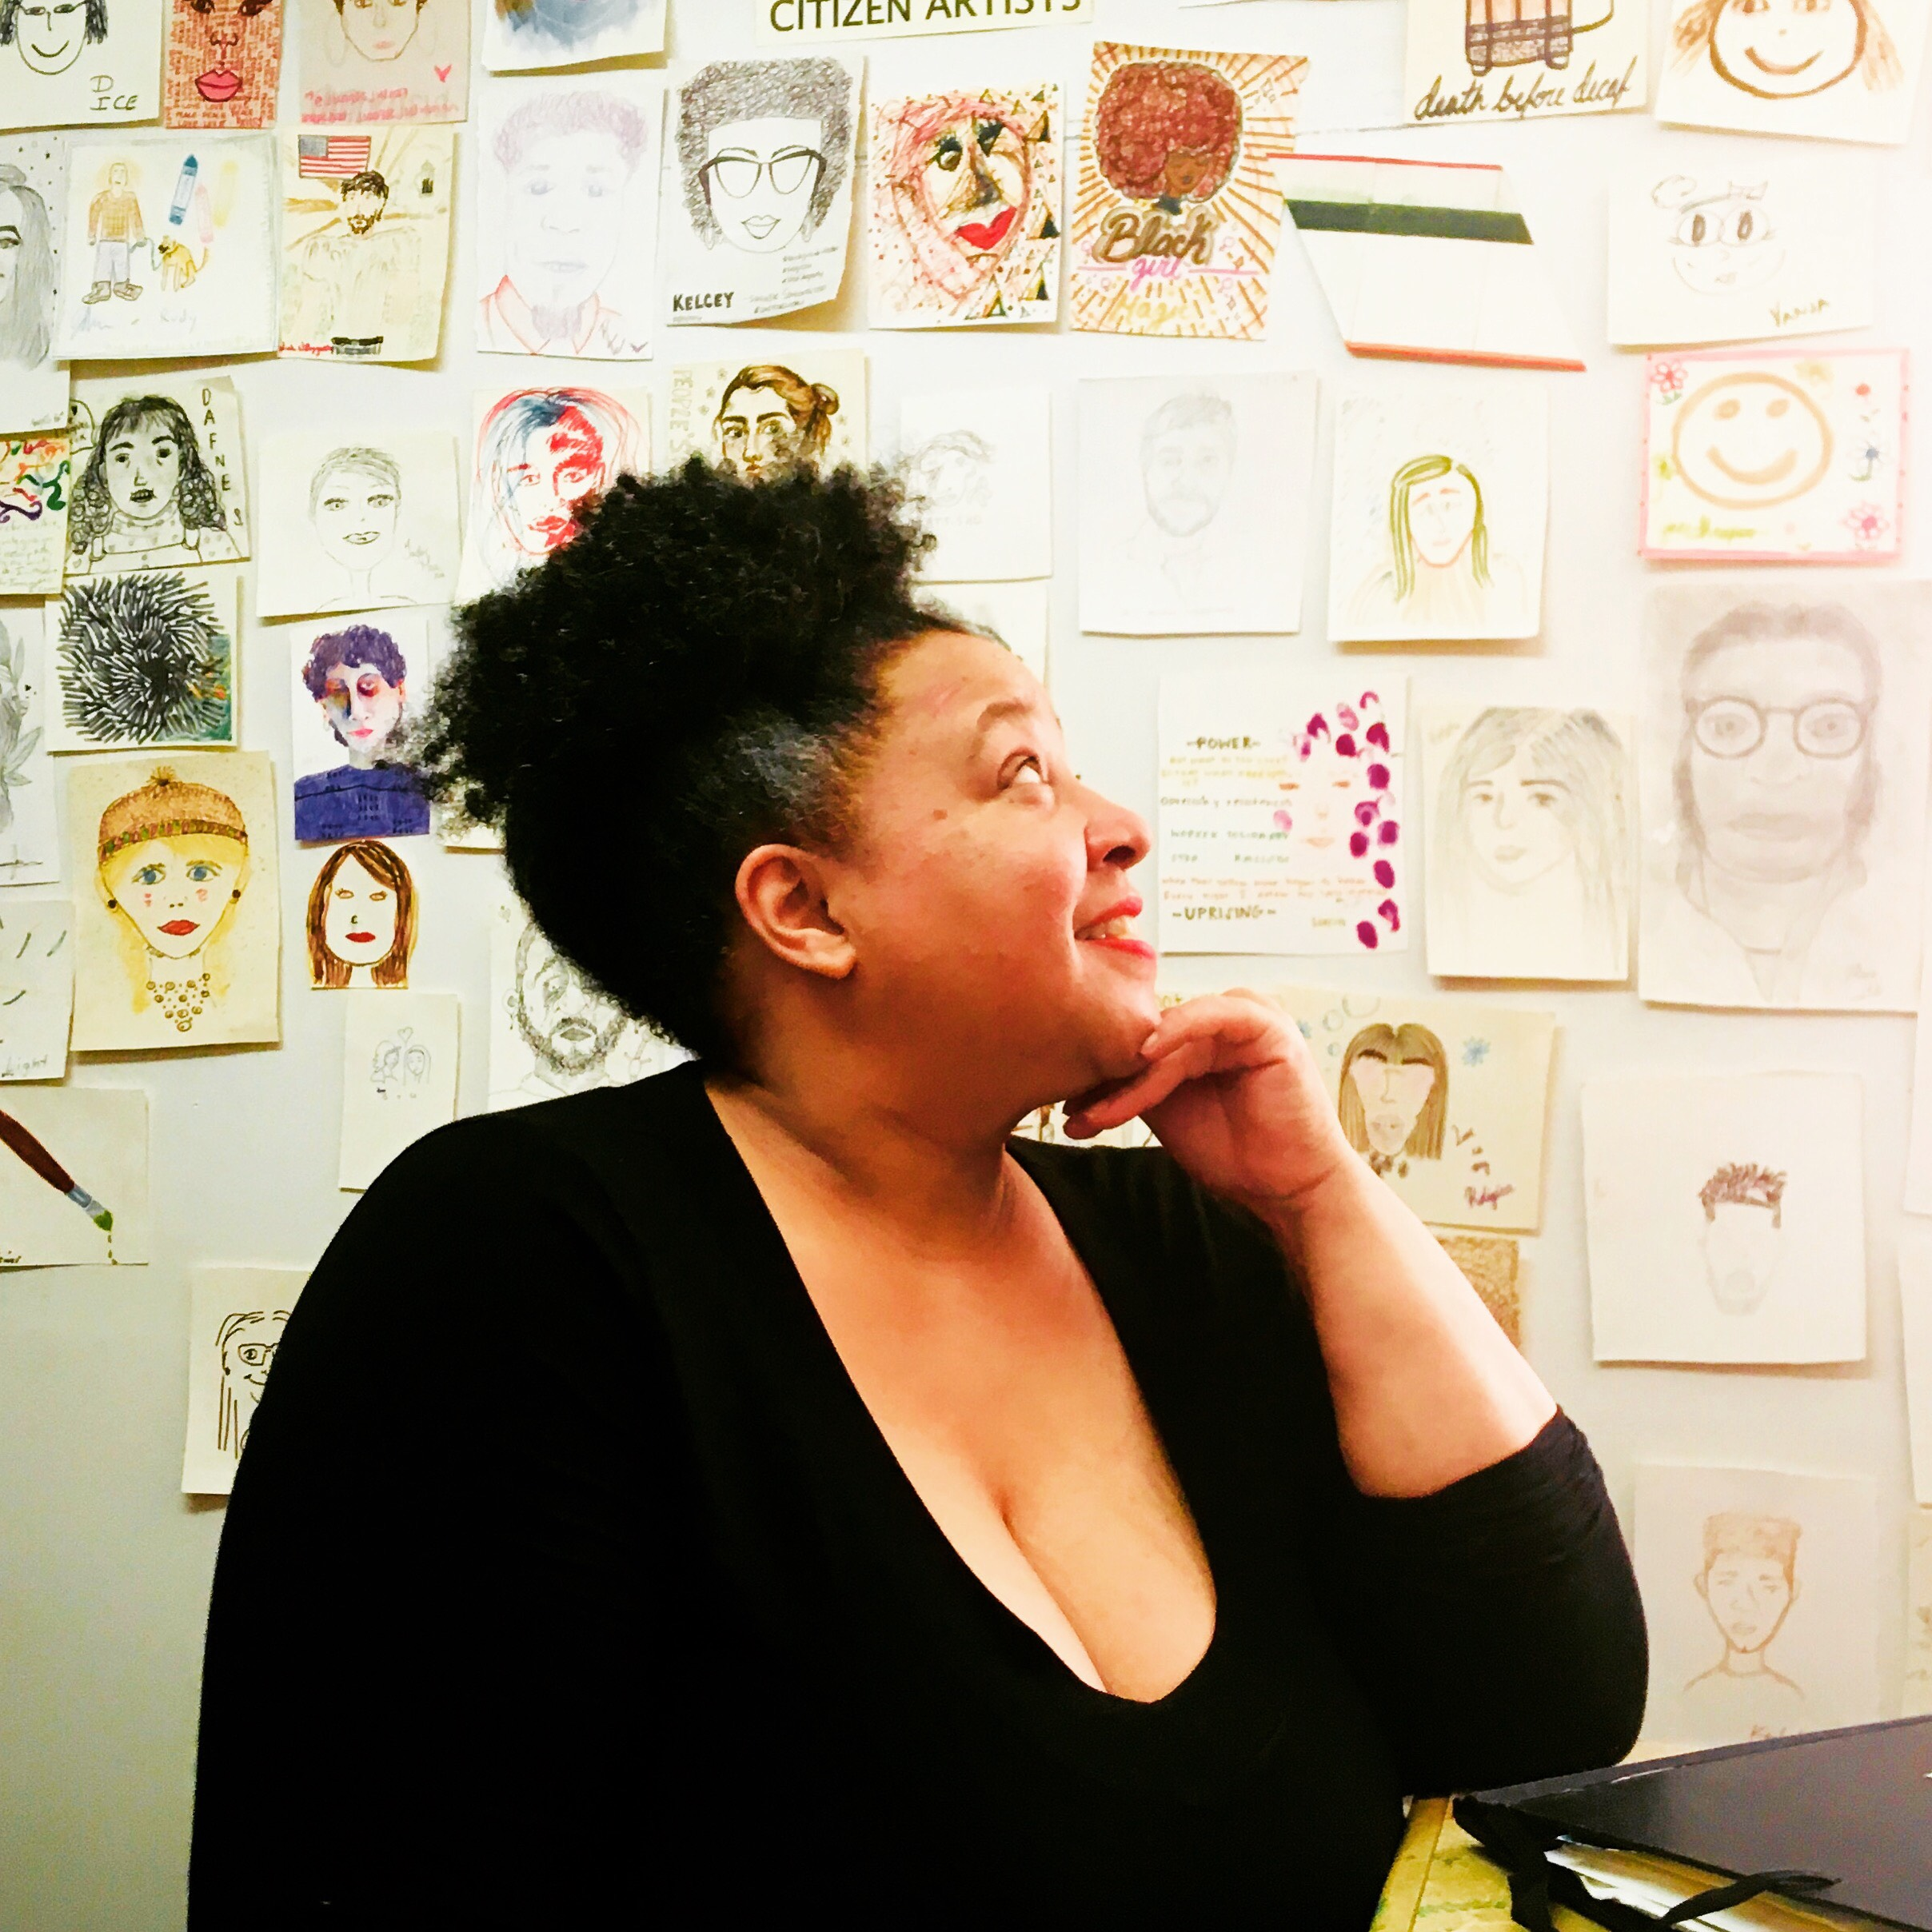 Karen in her studio inside The People's Perk surrounded by customer self portraits.